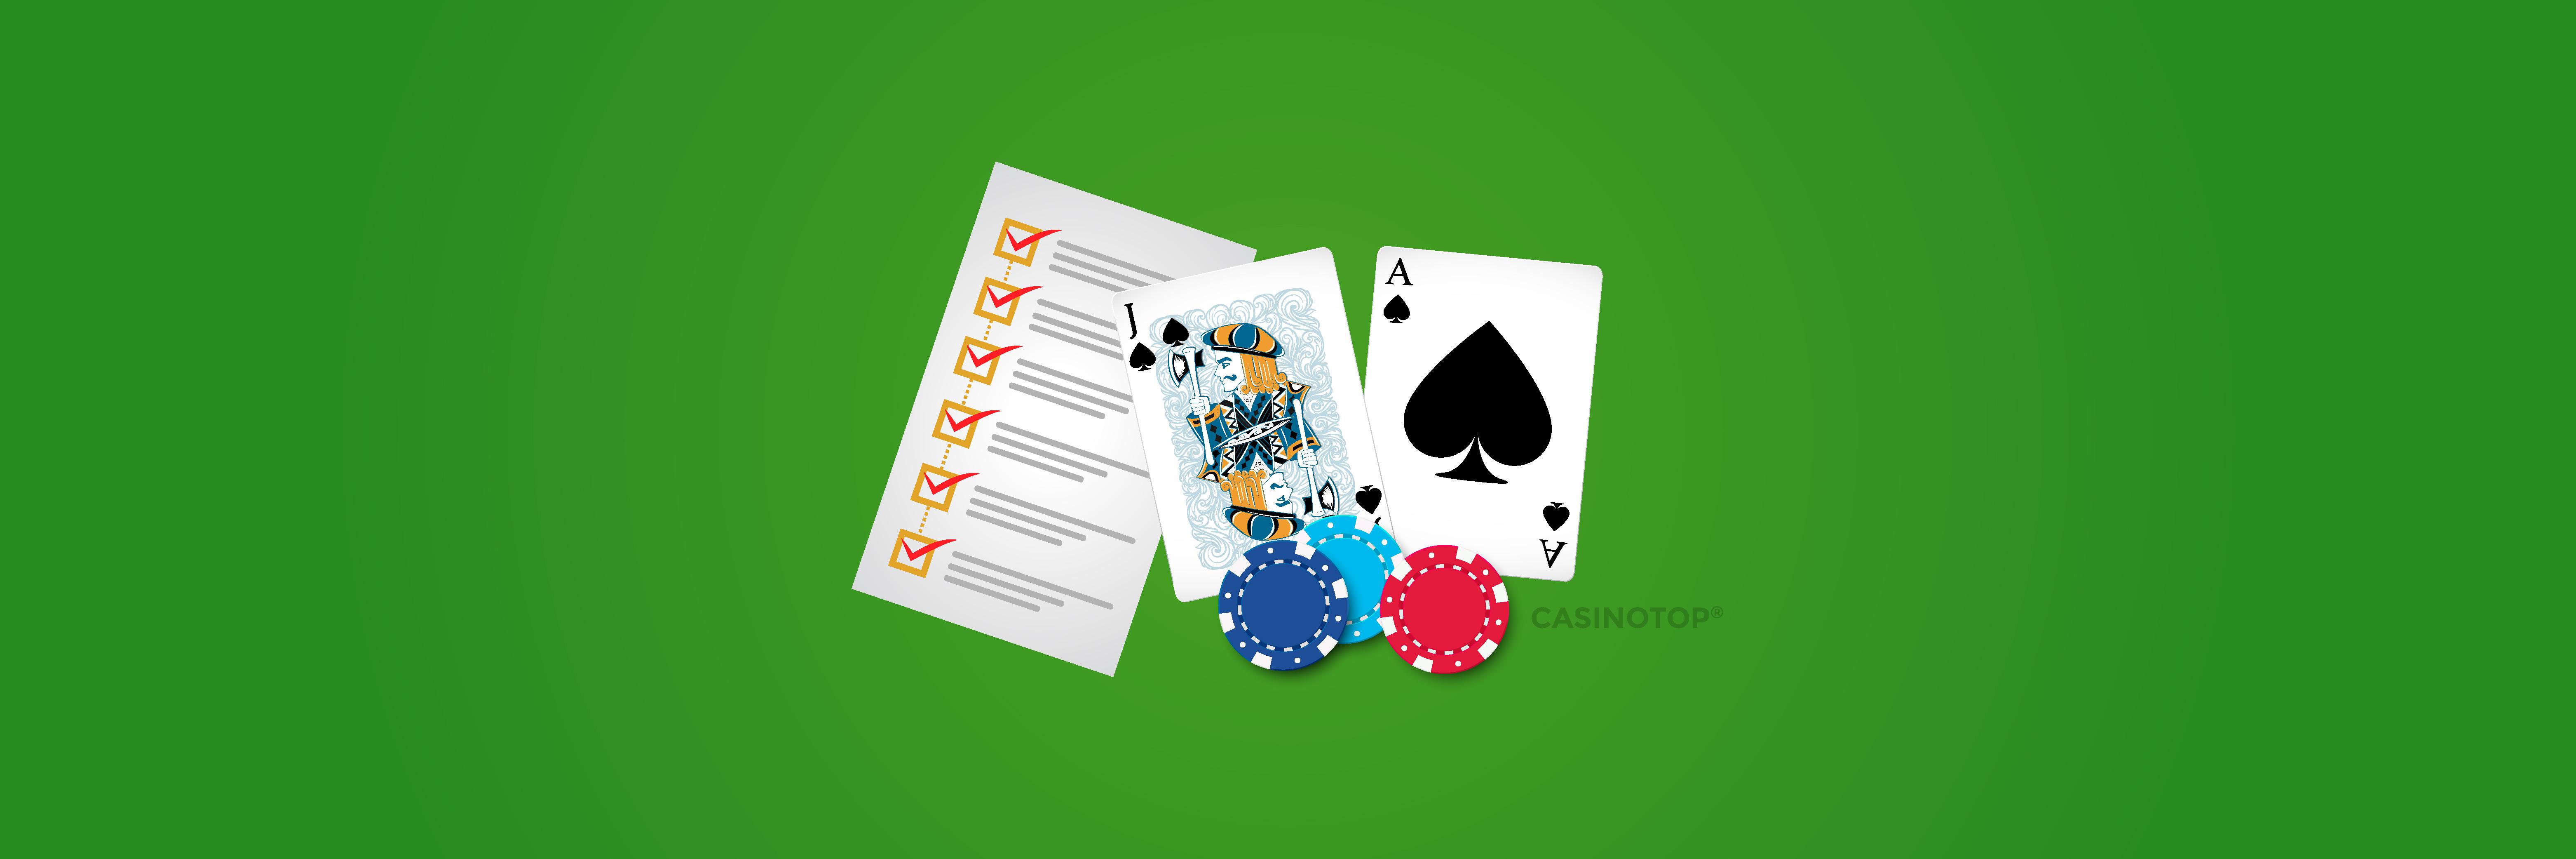 Expert Blackjack Guide Play Like A Pro In 10 Easy Steps Casinotop